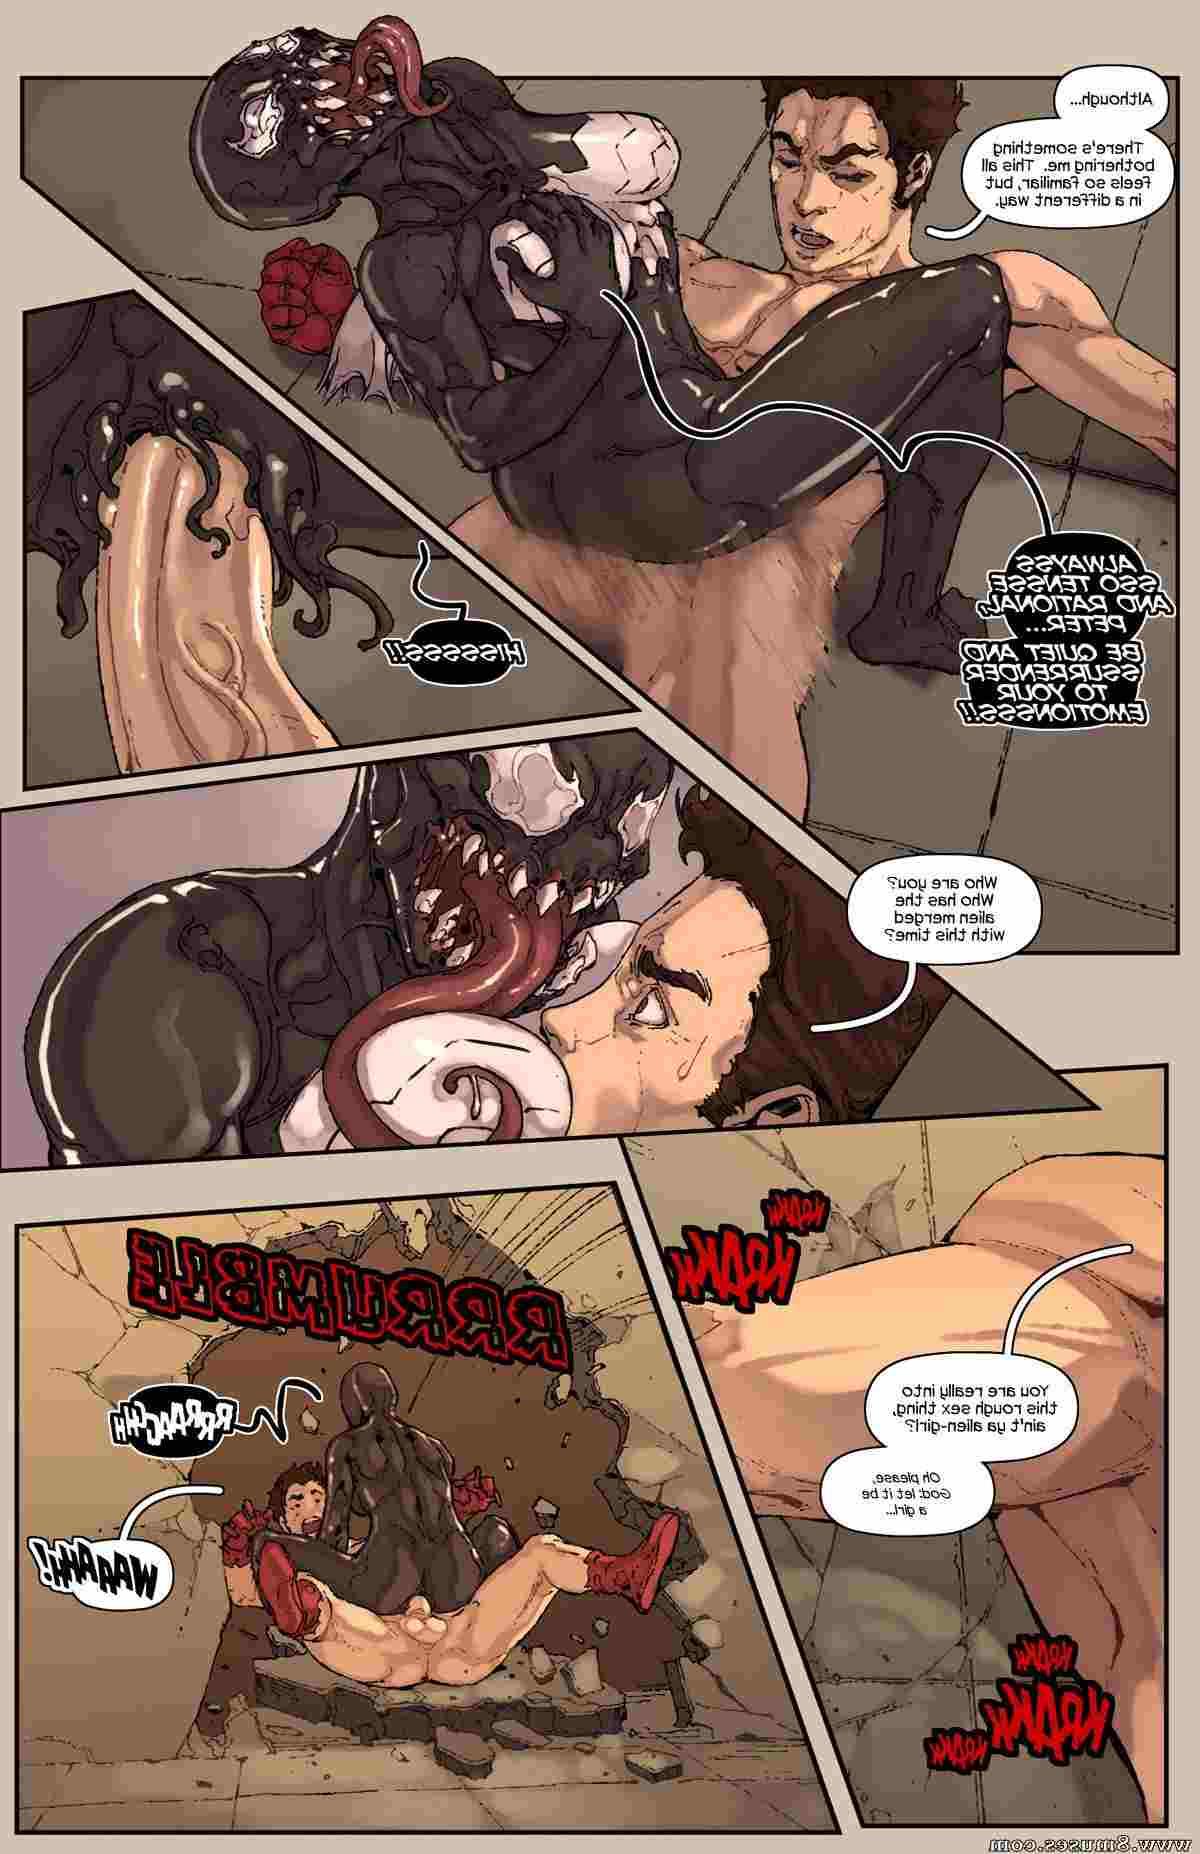 Tracy-Scops-Comics/Venomess Venomess__8muses_-_Sex_and_Porn_Comics_7.jpg